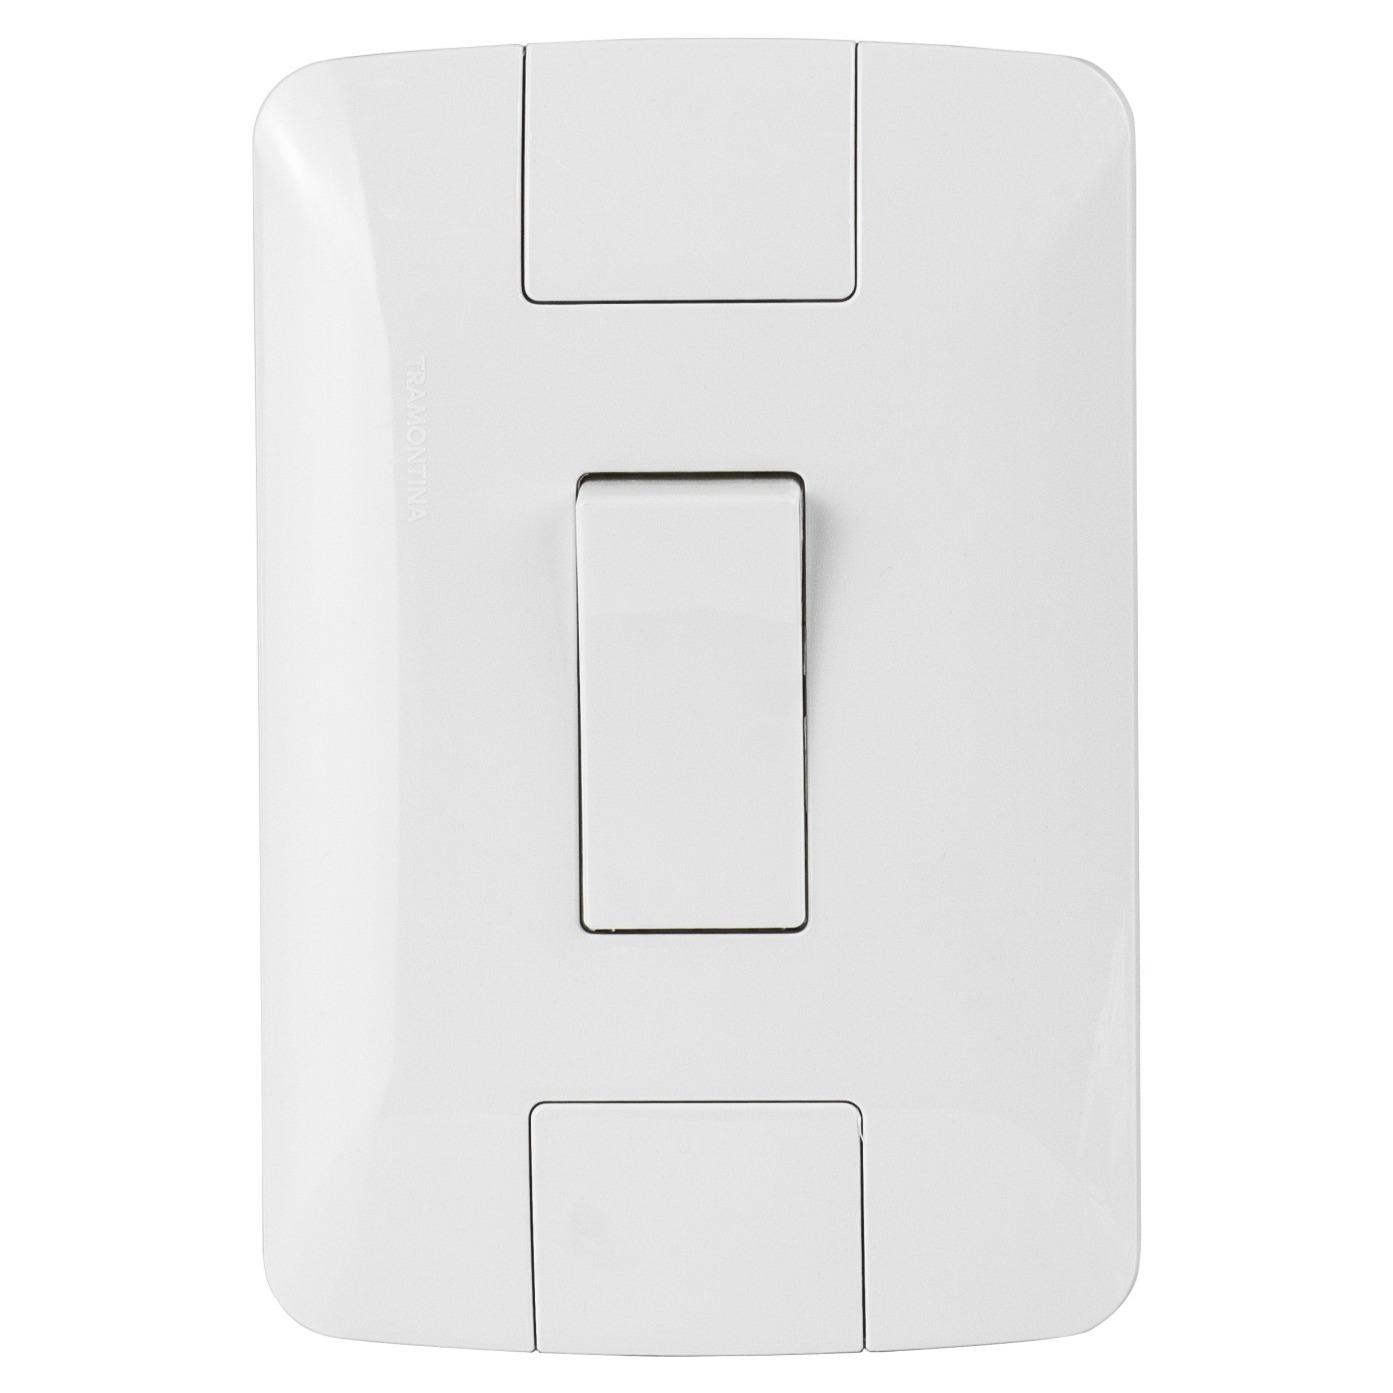 Conjunto Interruptor Simples 1 Modulo 6A 4X2 Branco Aria ABS - Tramontina